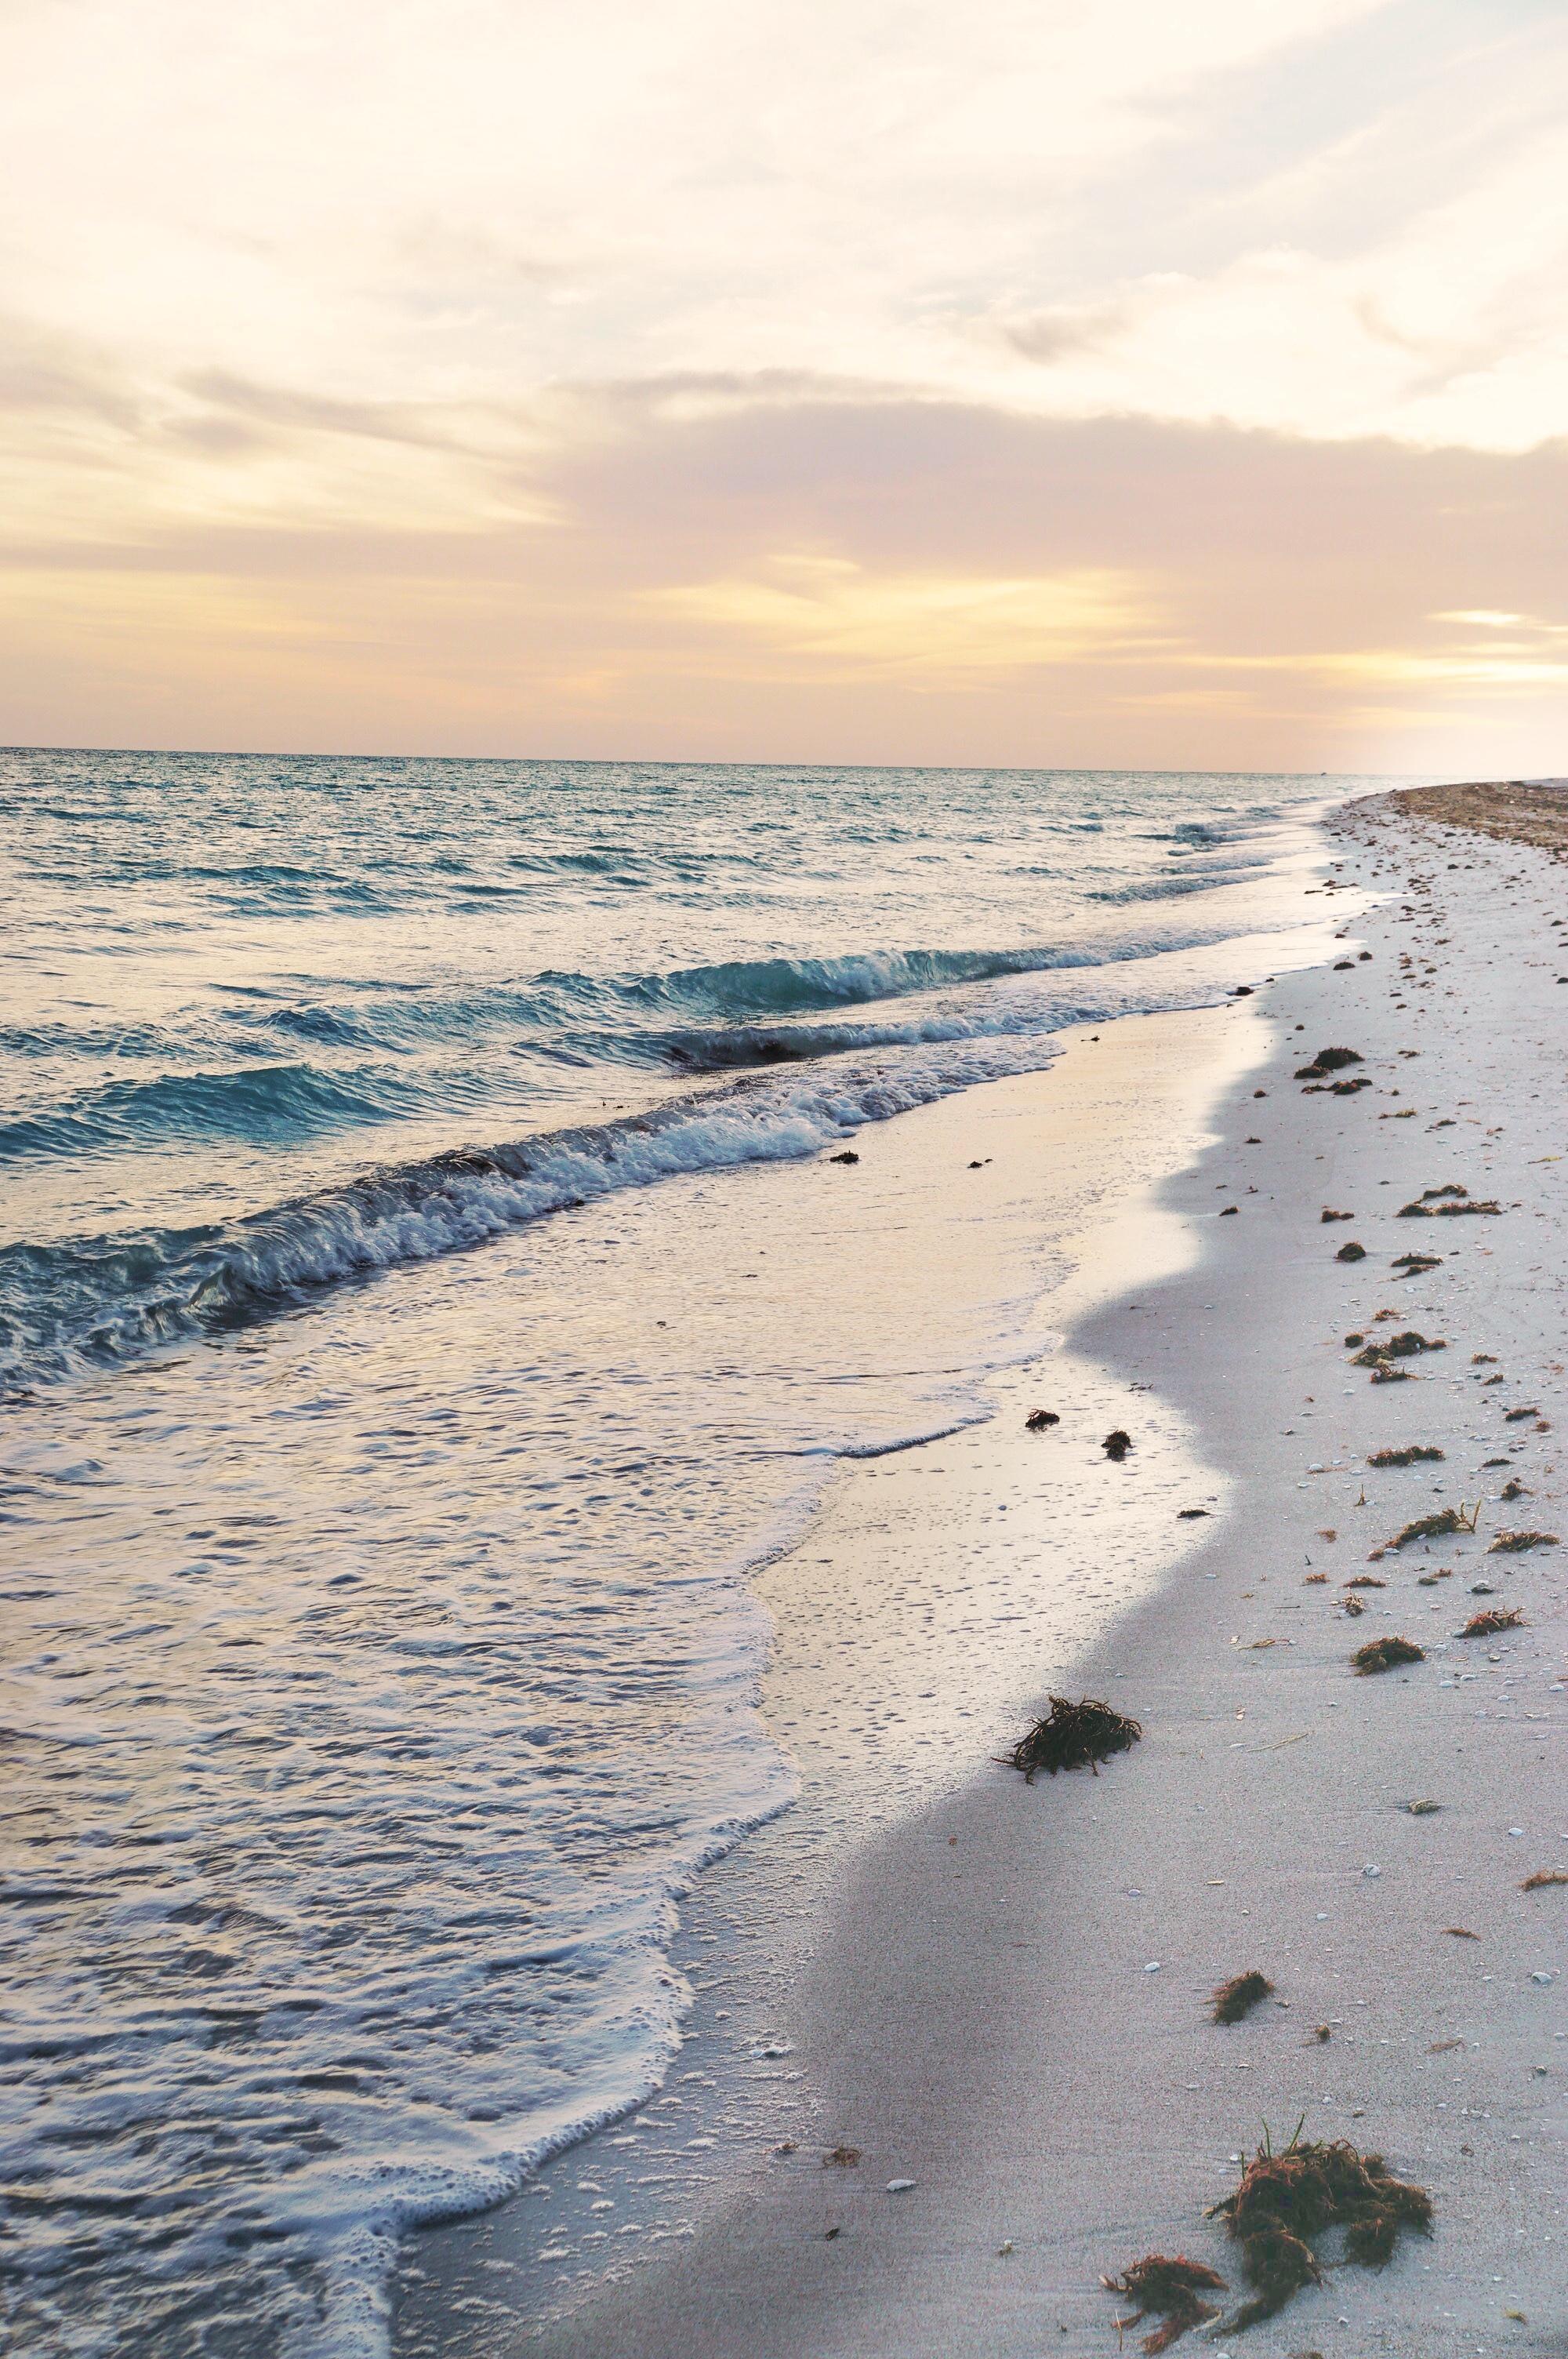 Sunrise in Playa Las Coloradas